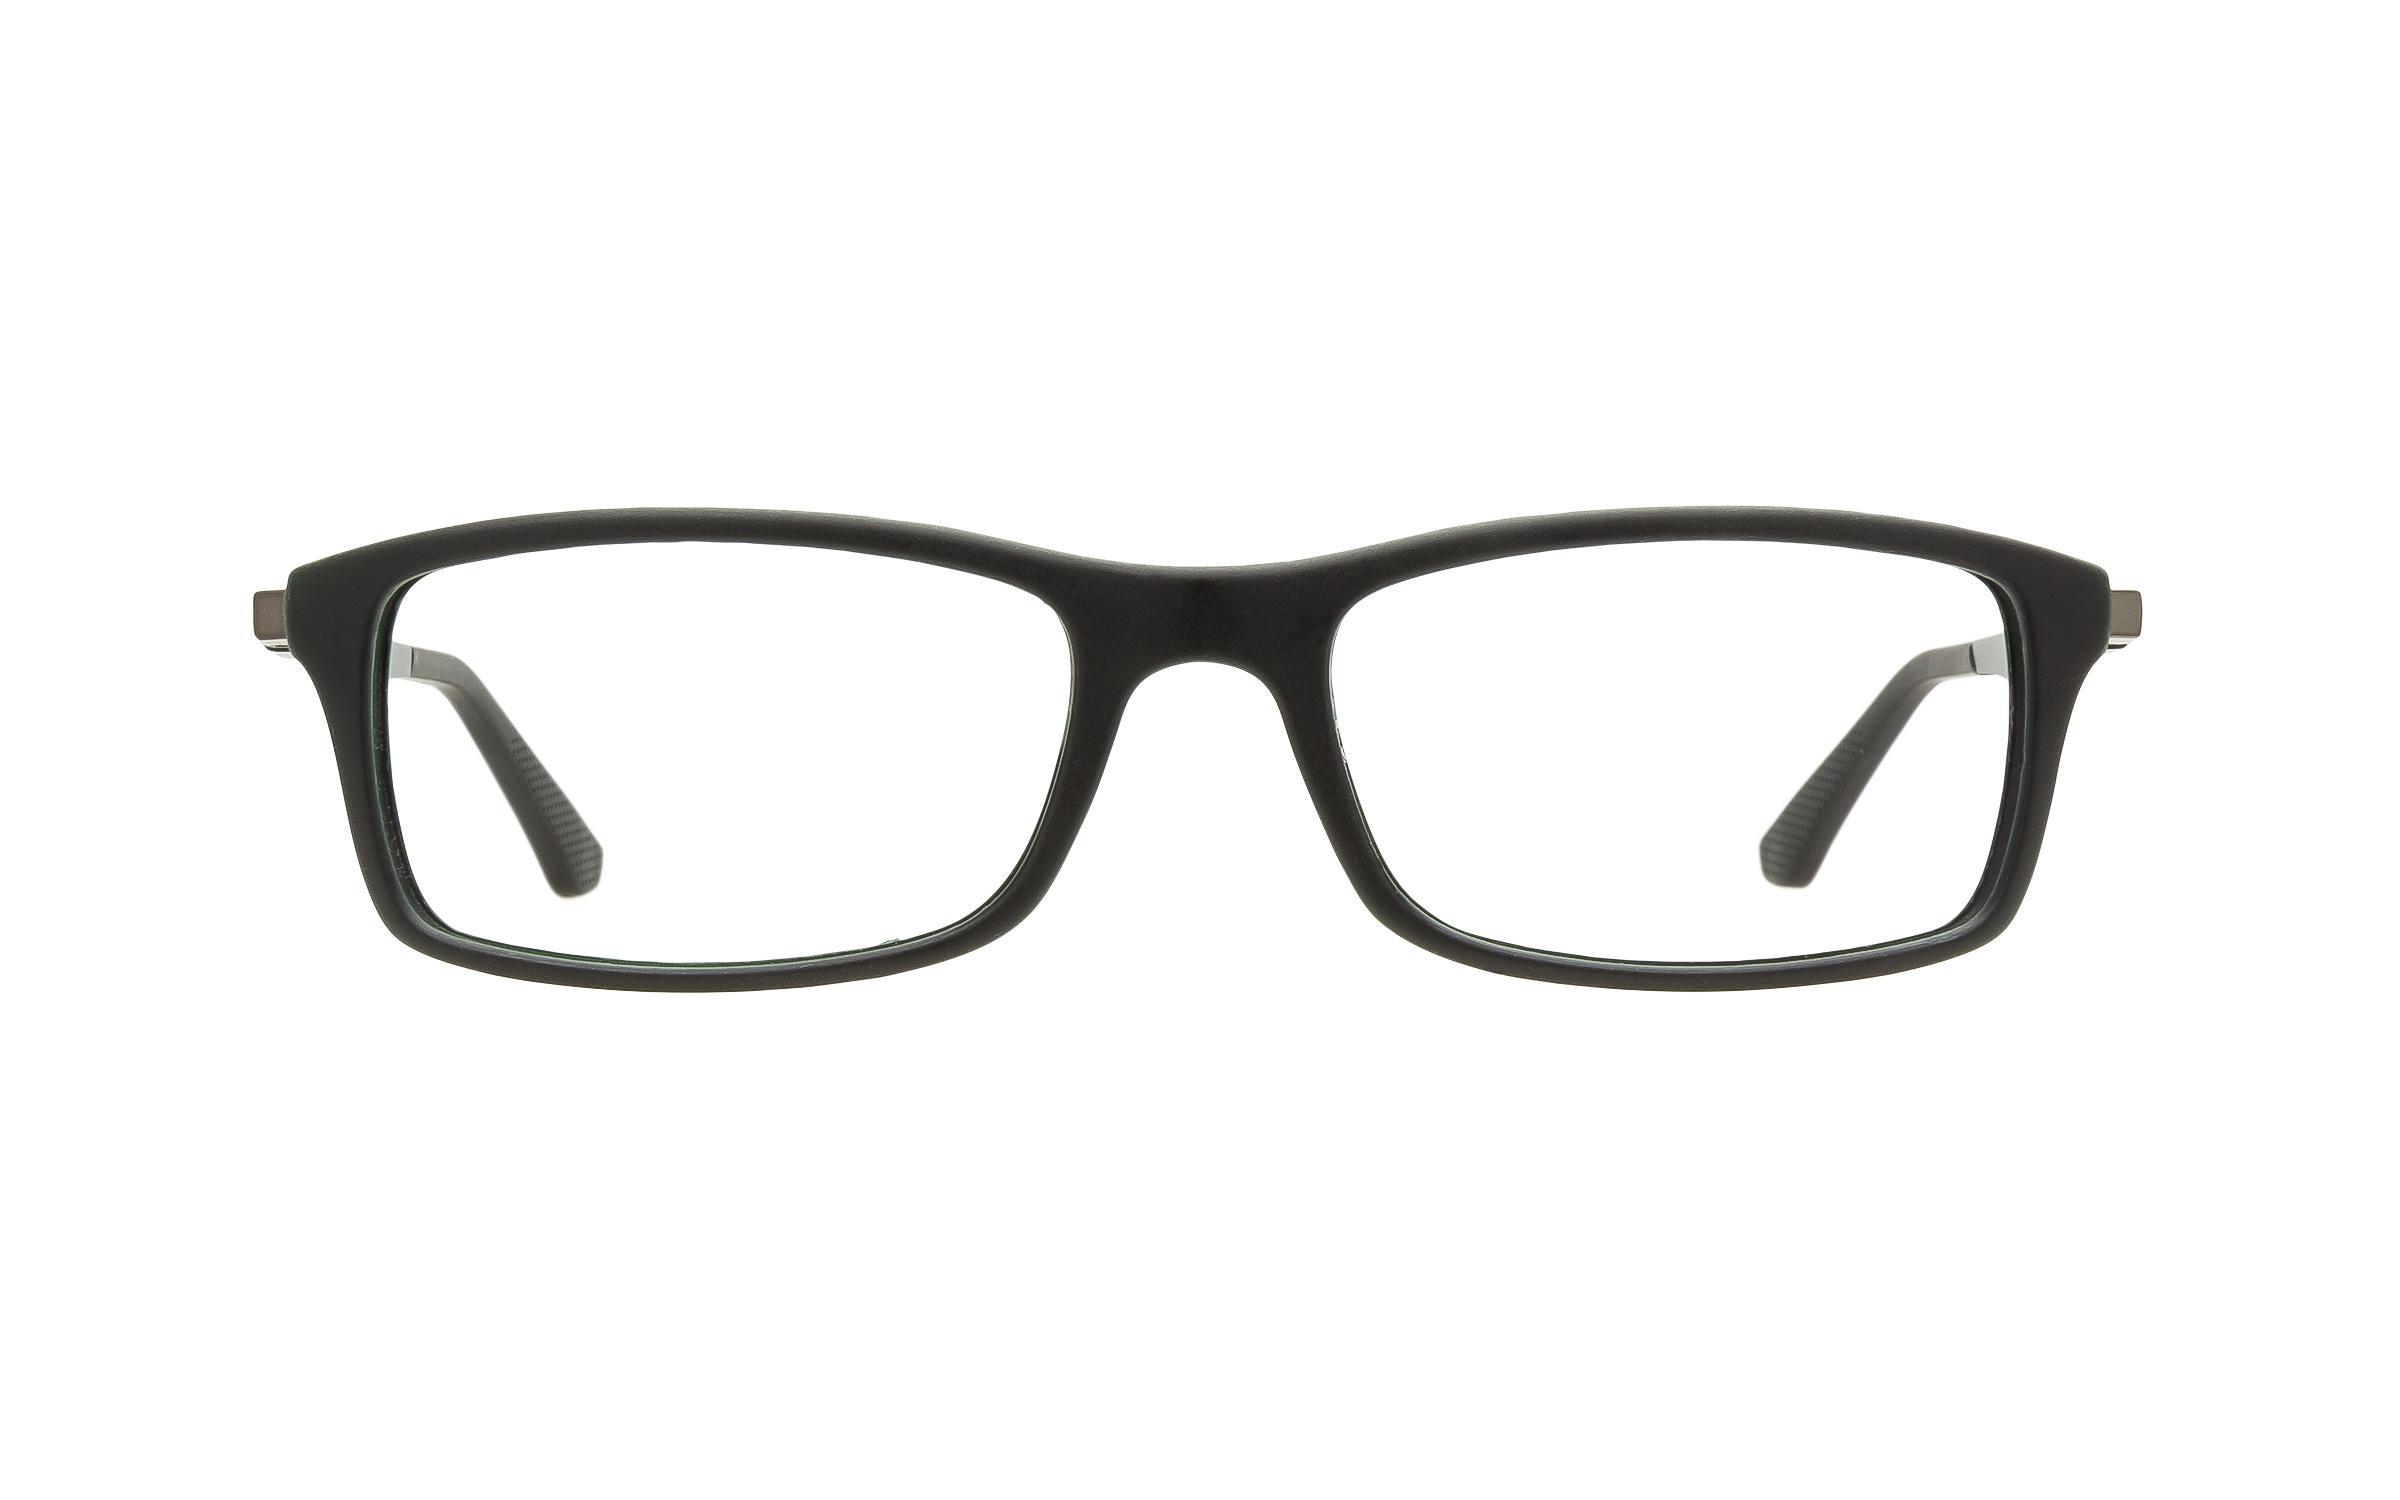 http://www.coastal.com/ - Luxottica Ray-Ban RB7017 5197 Eyeglasses and Frame in Black/Green | Metal – Online Coastal